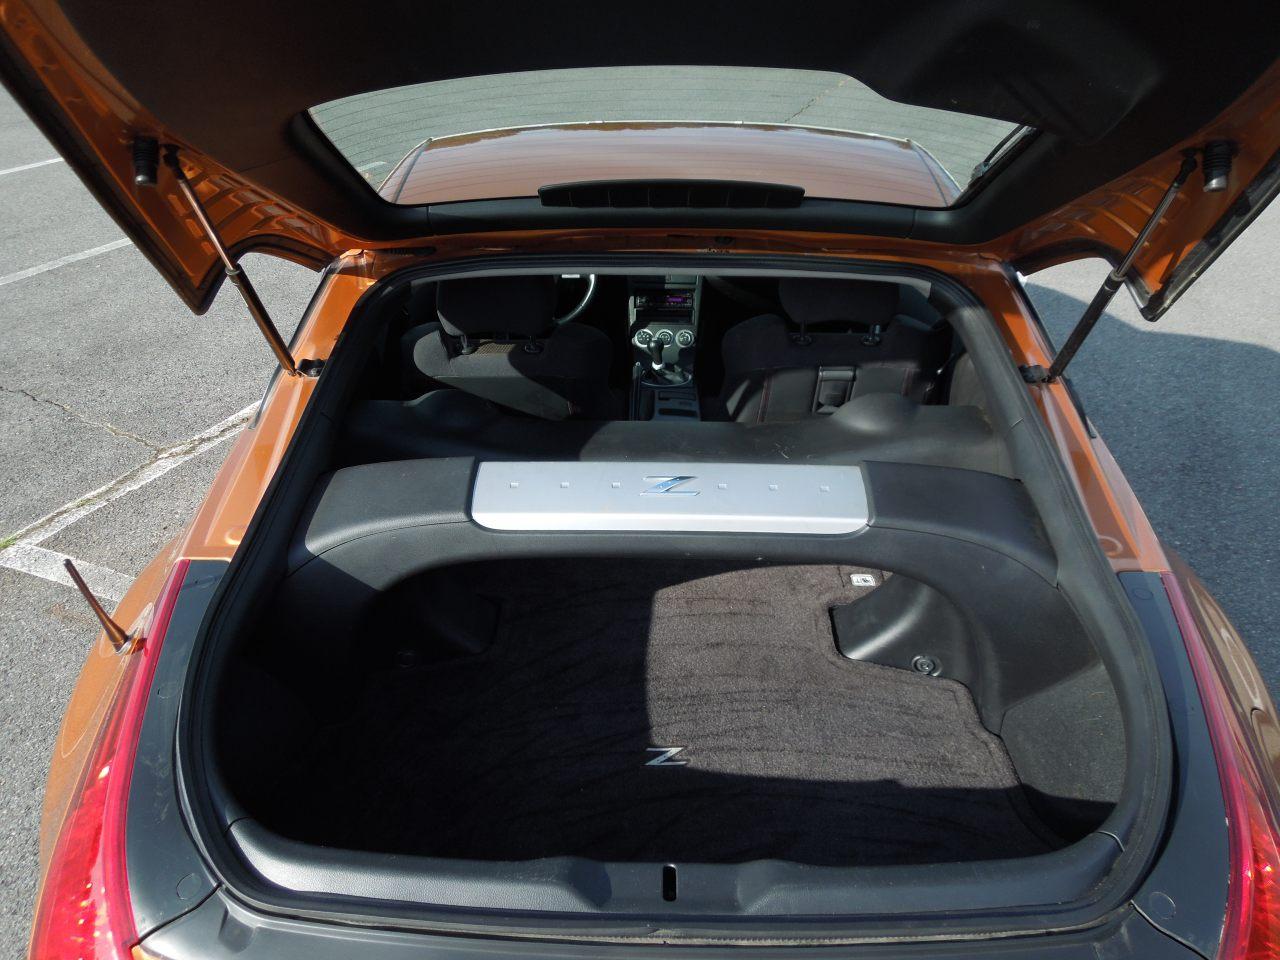 Car picker nissan 350z interior images 350z interior image vanachro Image collections